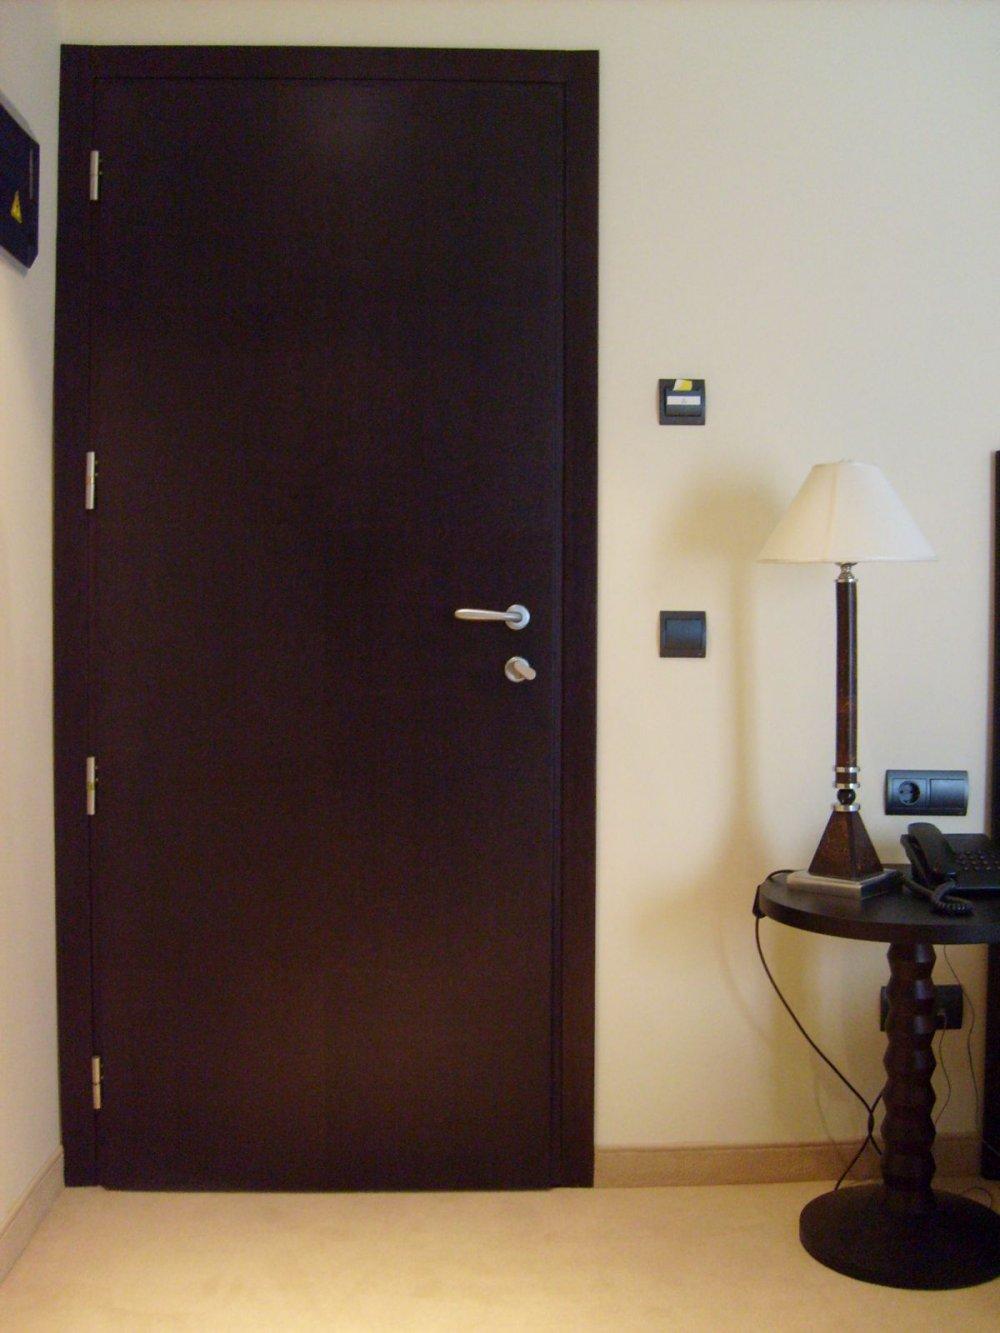 Serramenti porte e arredi per hotel alfa falegnameria for Arredi per alberghi e hotel